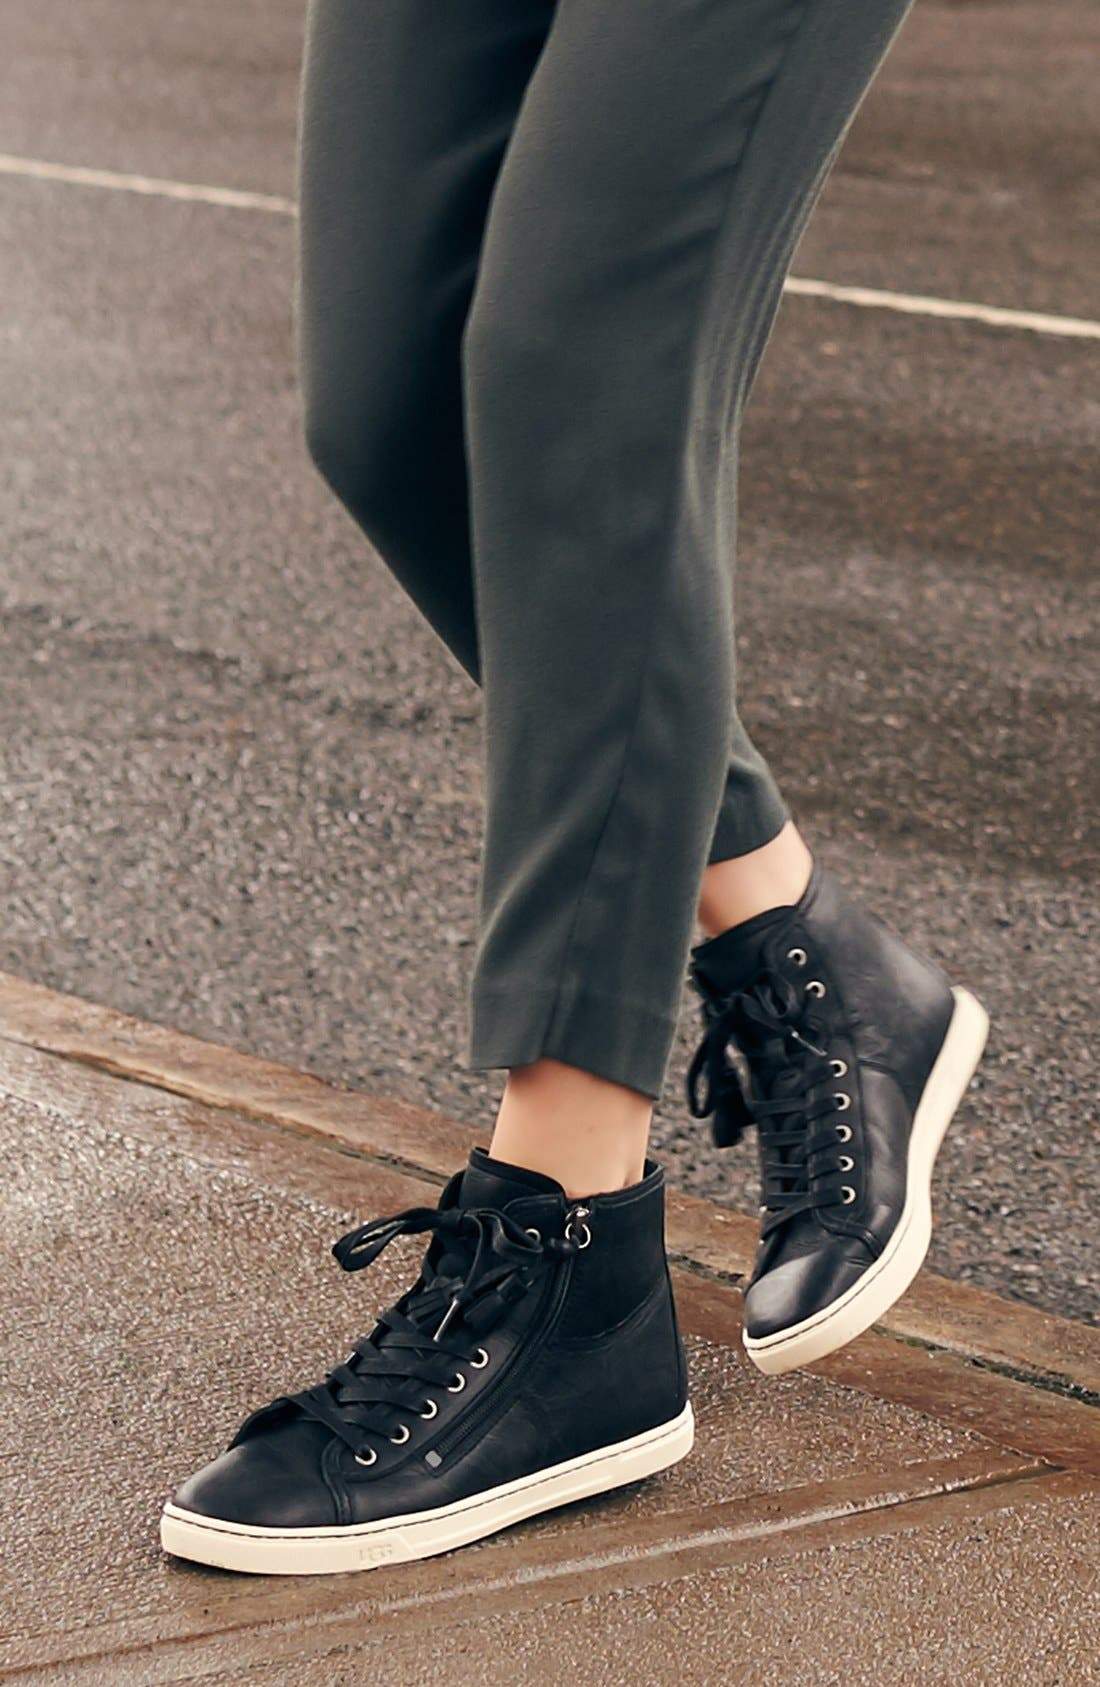 UGG<SUP>®</SUP> 'Blaney' Tasseled High Top Sneaker, Main, color, 001